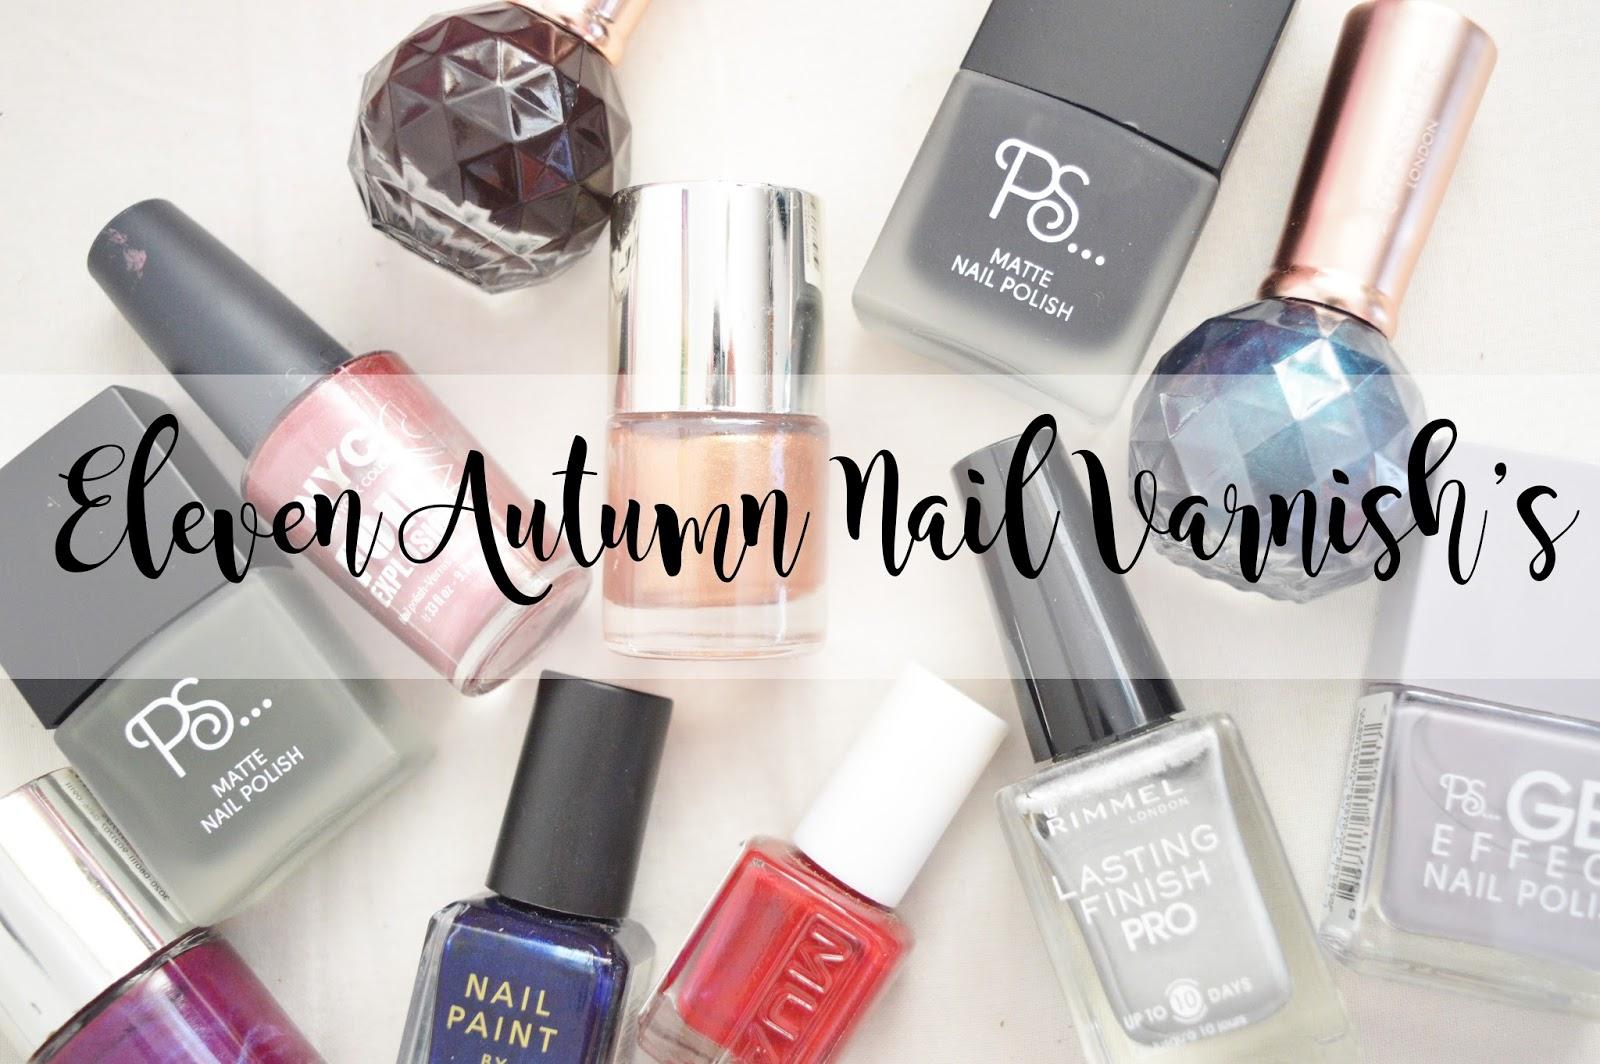 Eleven Autumn Nail Varnishes - Kimberley Jessica